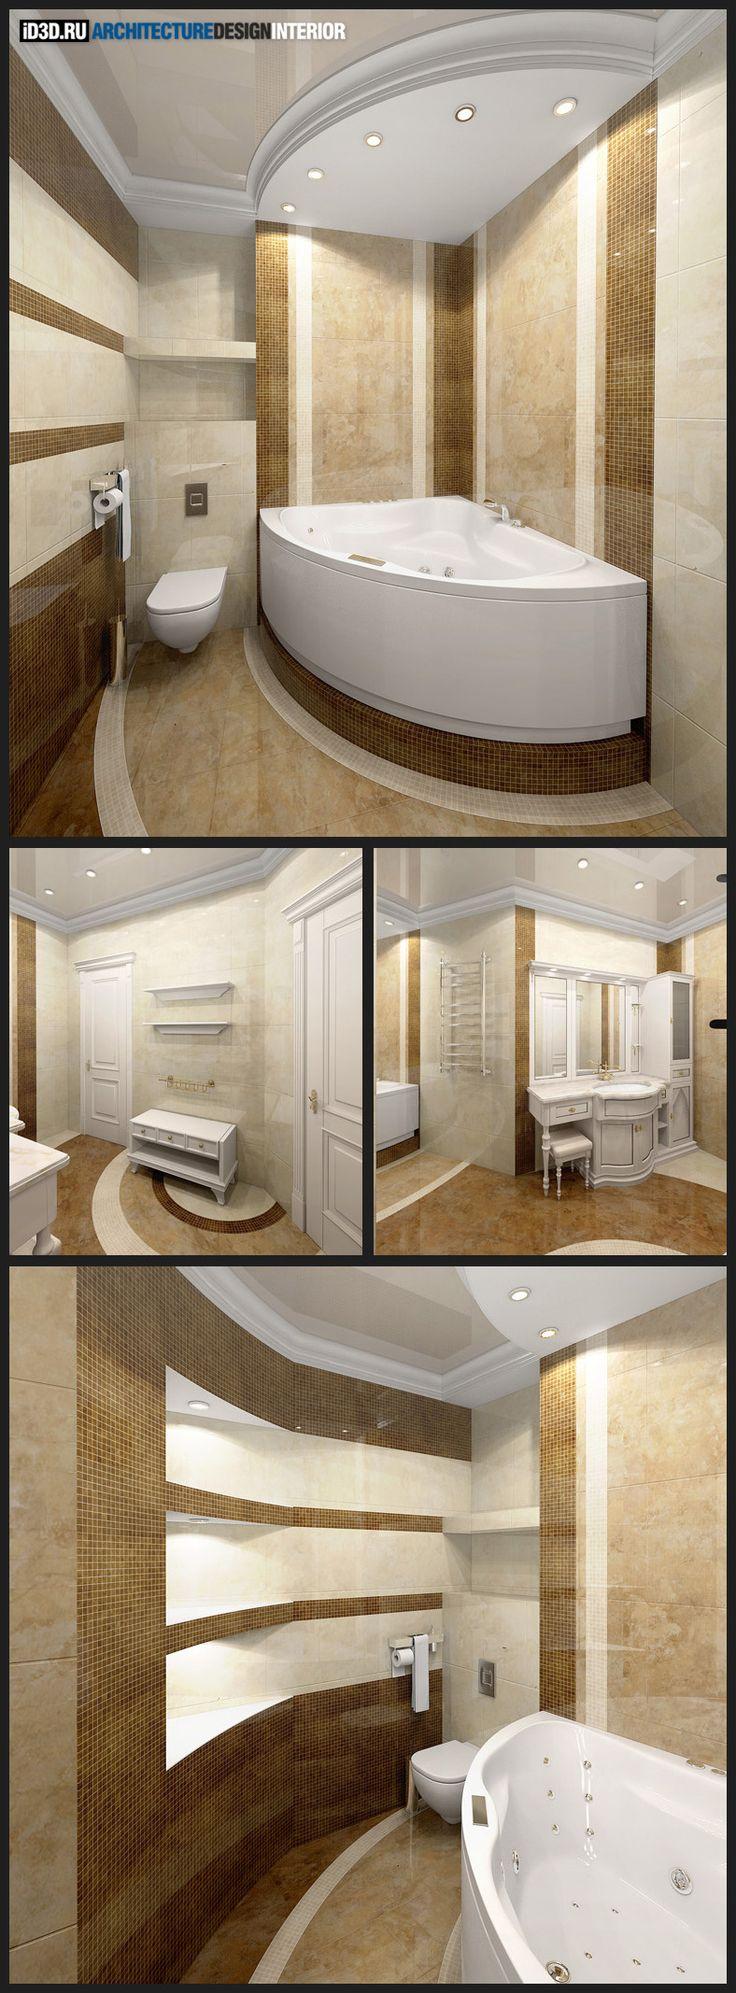 интерьер ванной комнаты, угловая ванна, мозаика